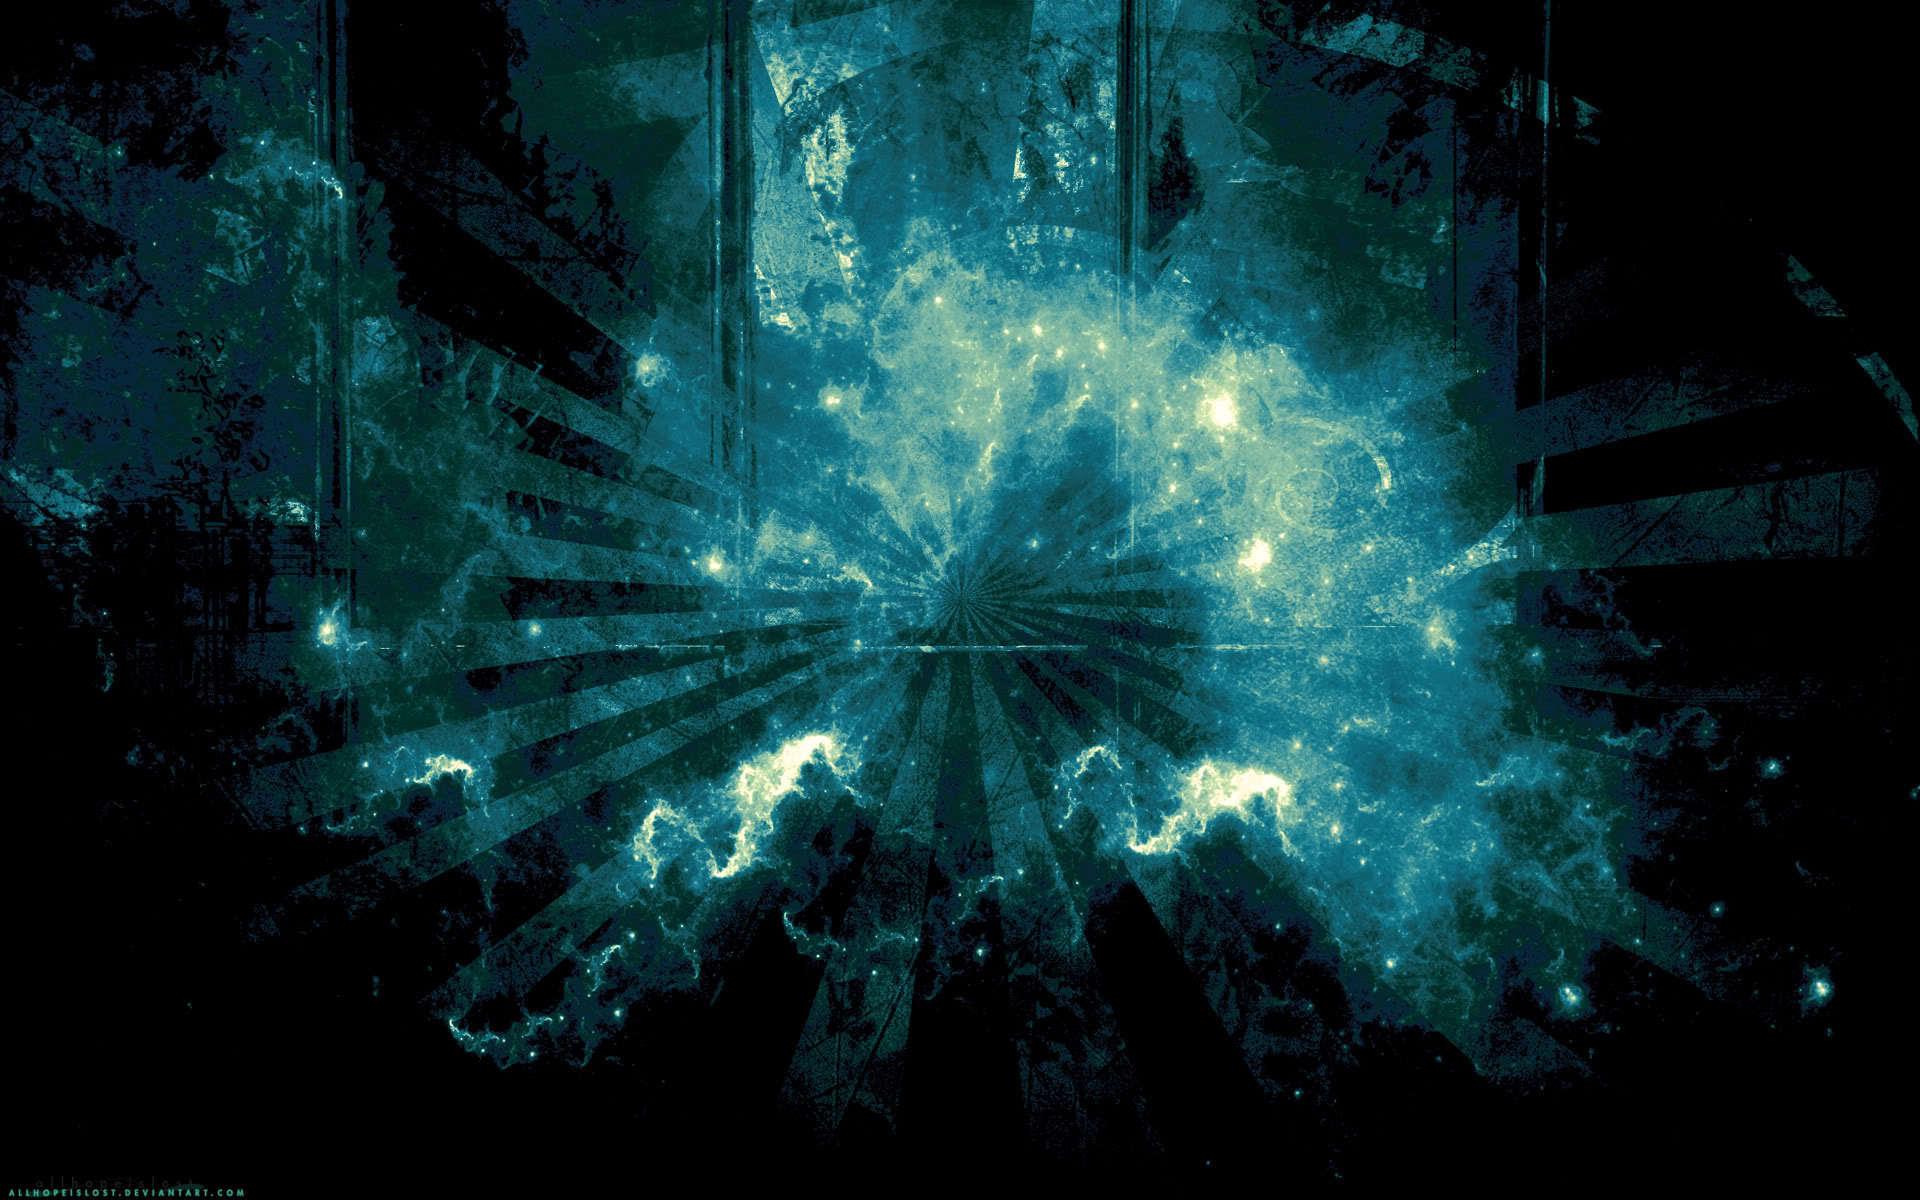 Glow In The Dark Wallpaper 1920x1200 57032